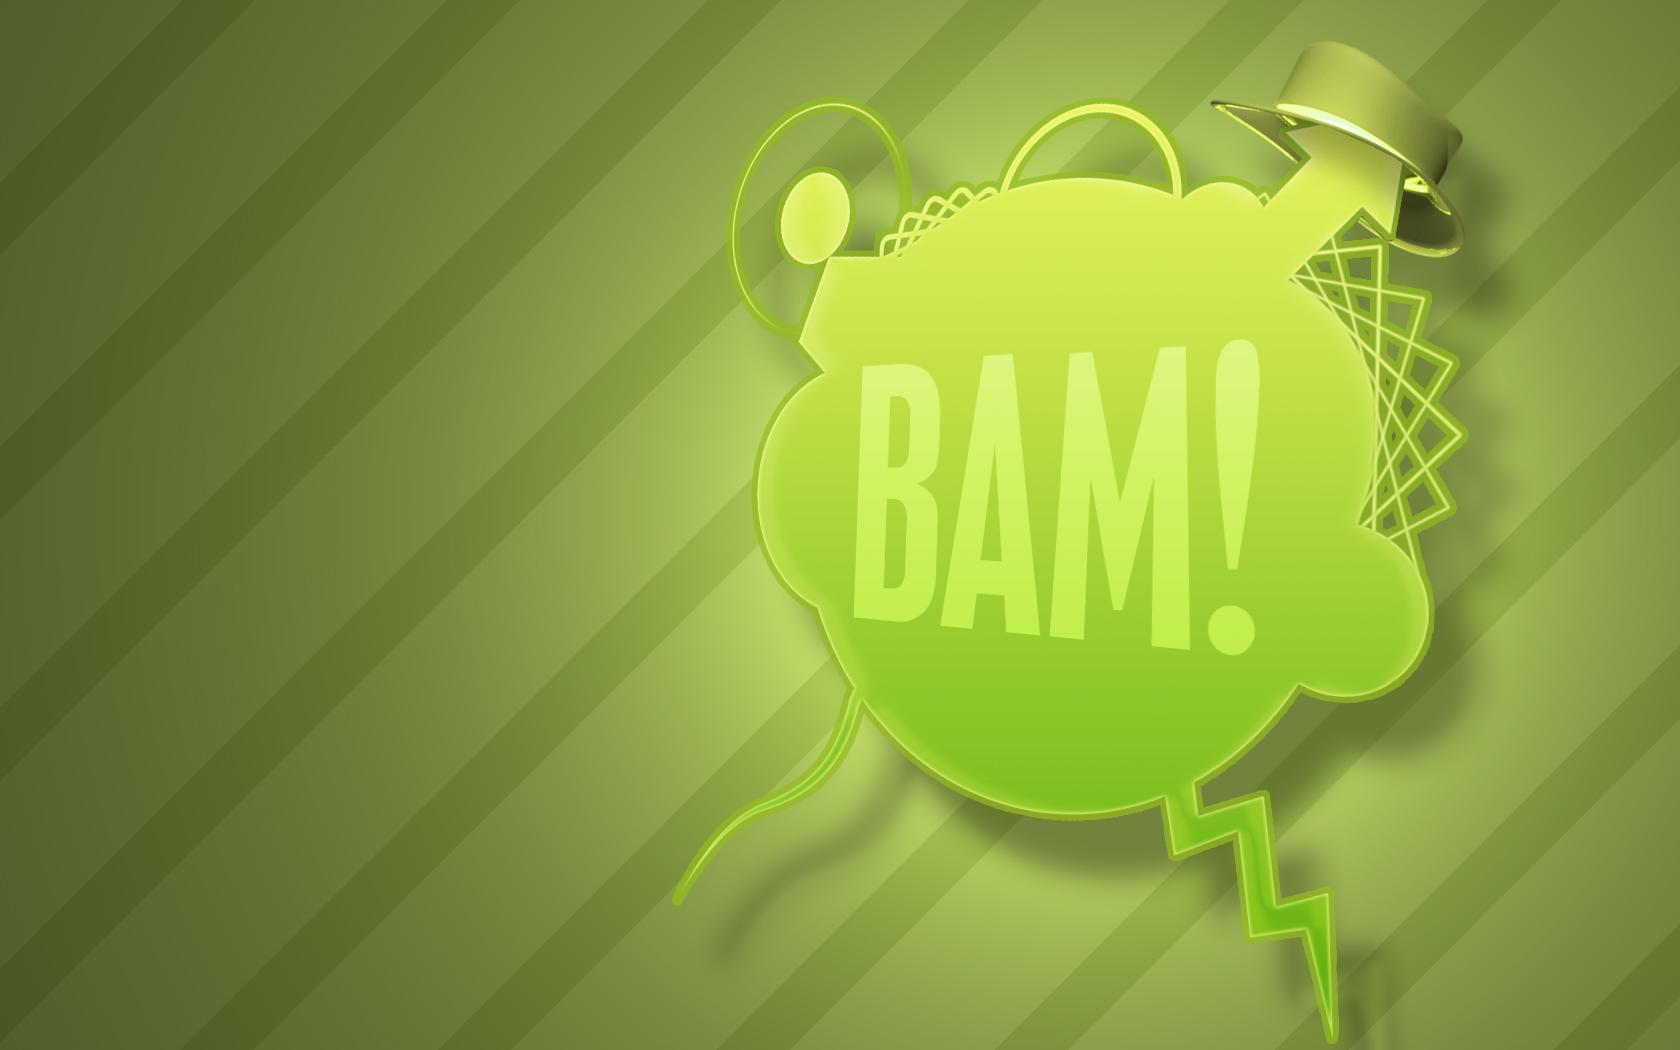 BAM! Wallpaper